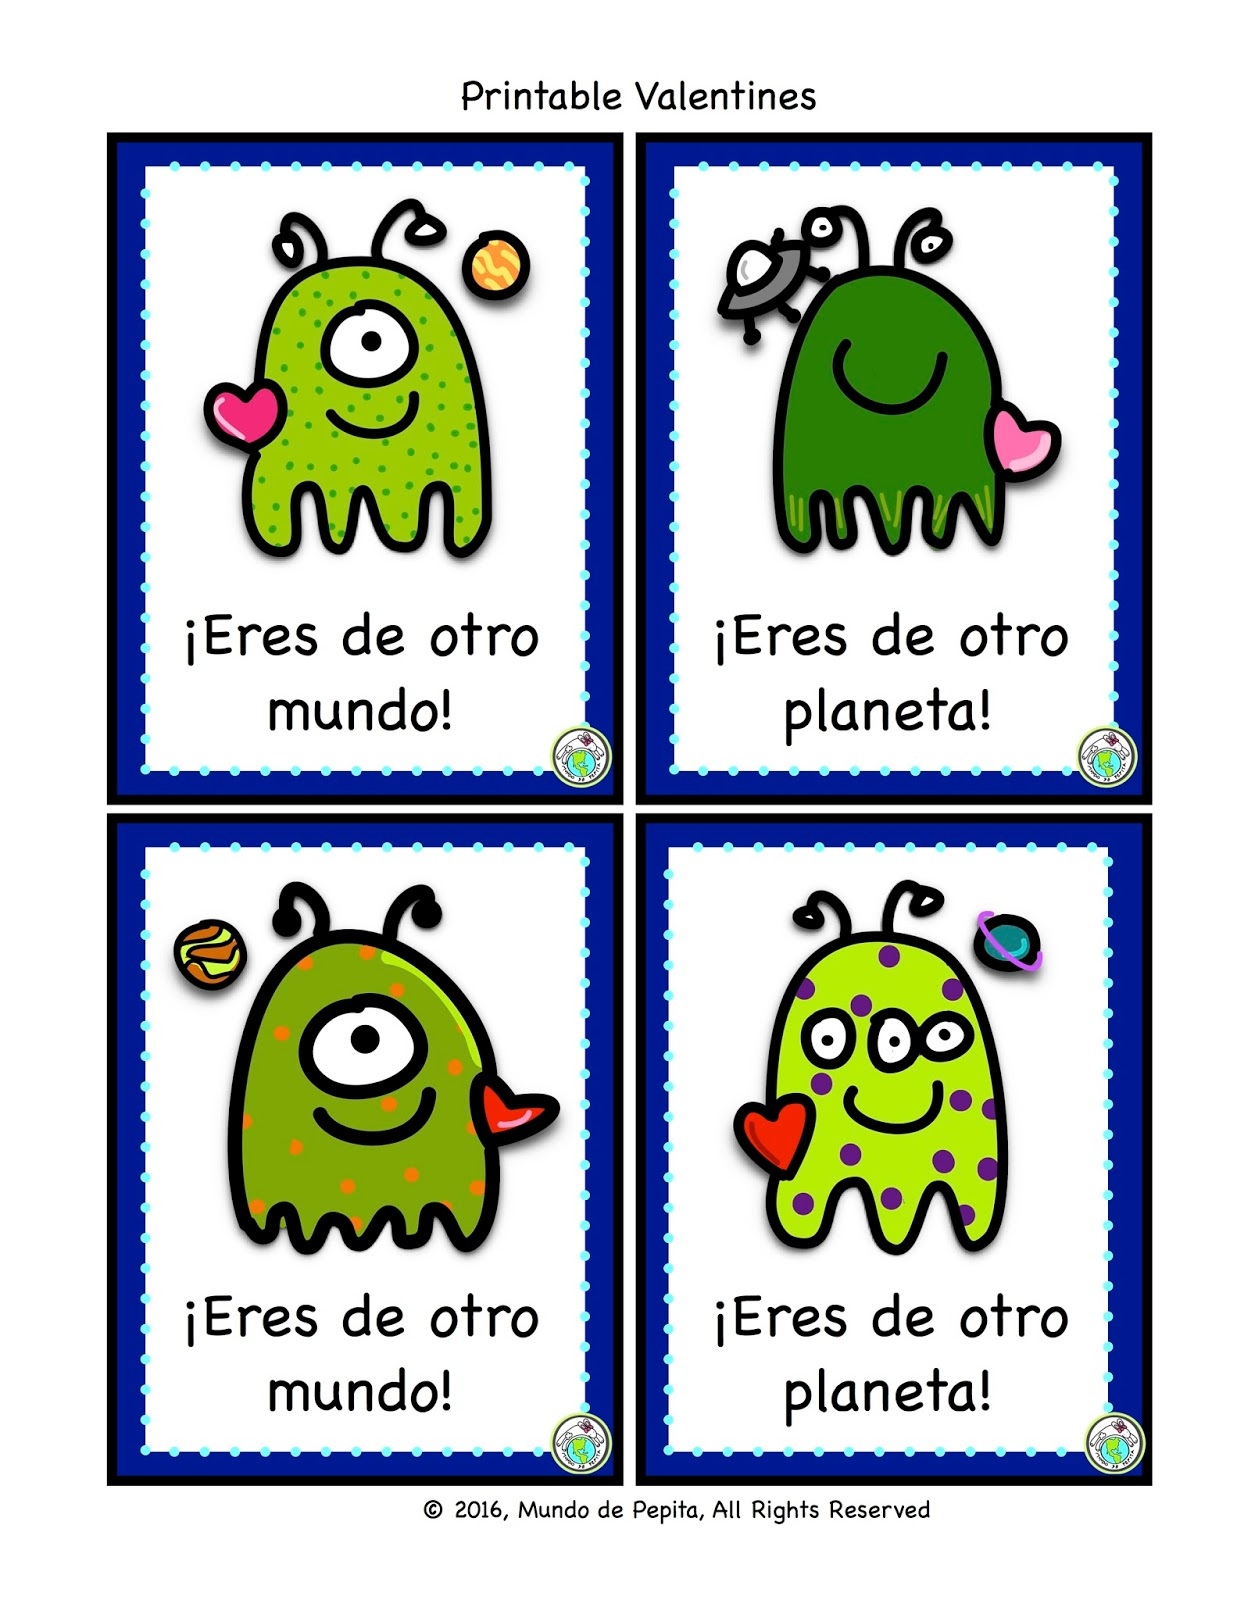 mundo de pepita printable spanish valentines for kids